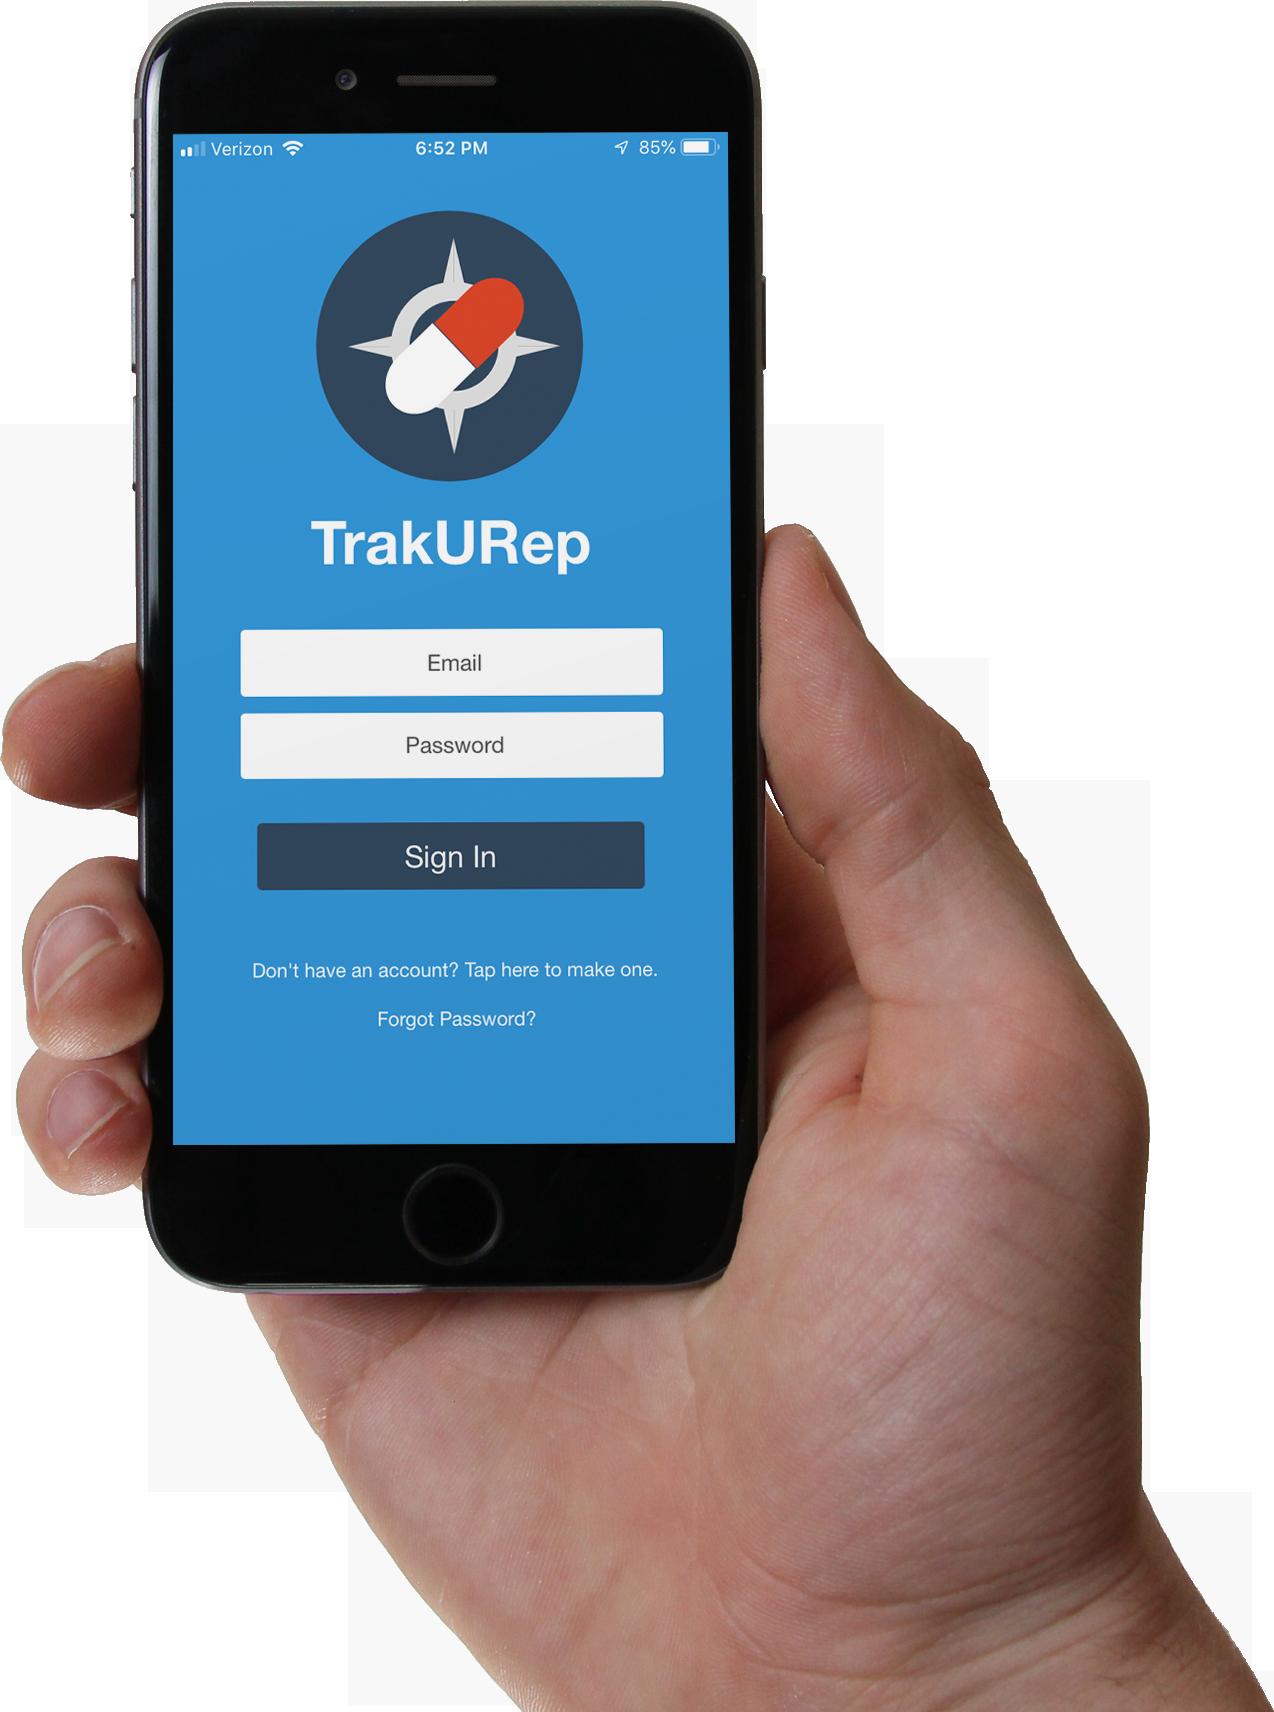 TrakURep App